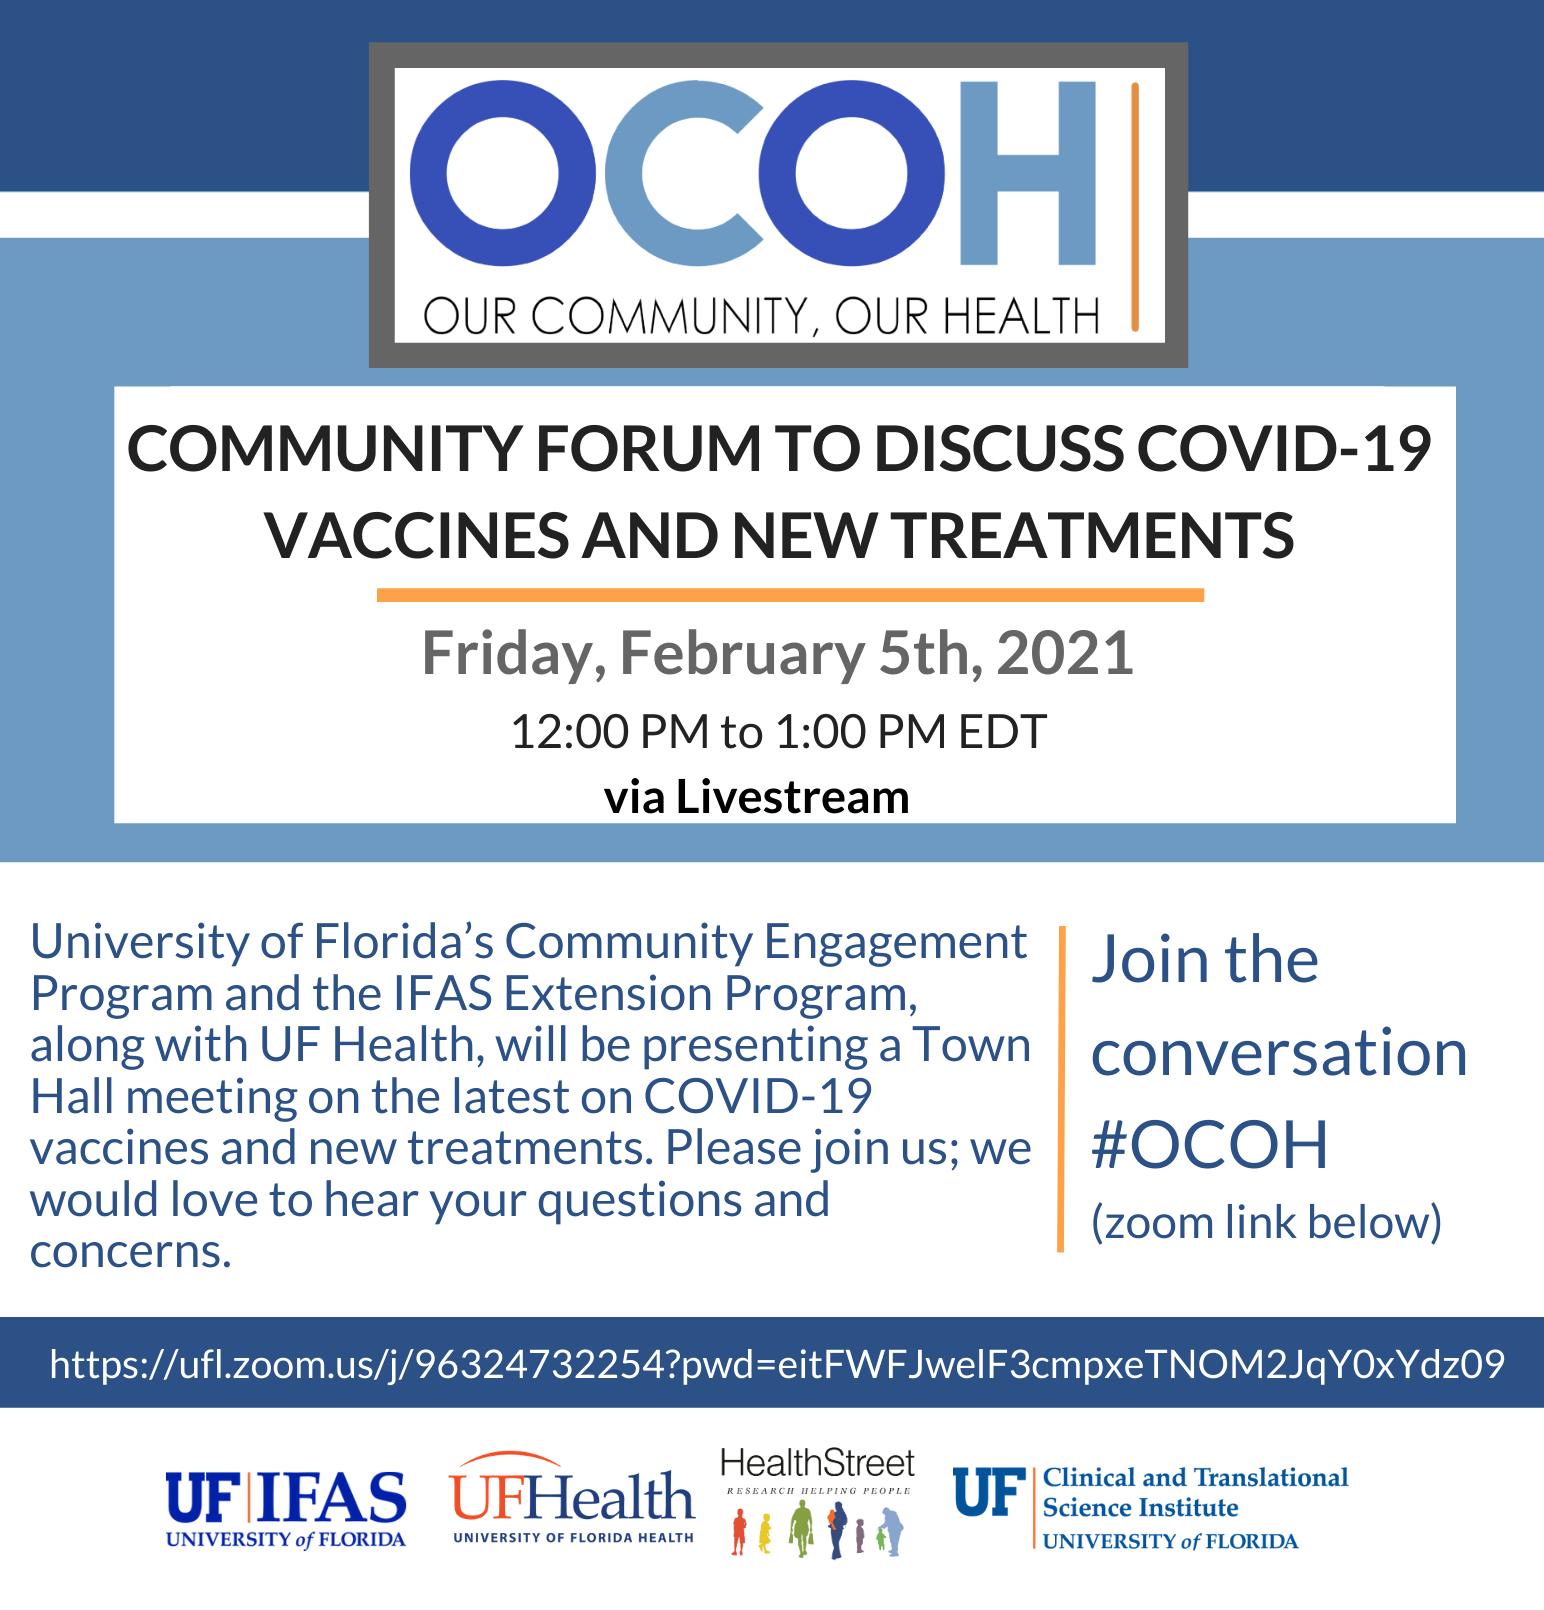 Community Forum OCOH